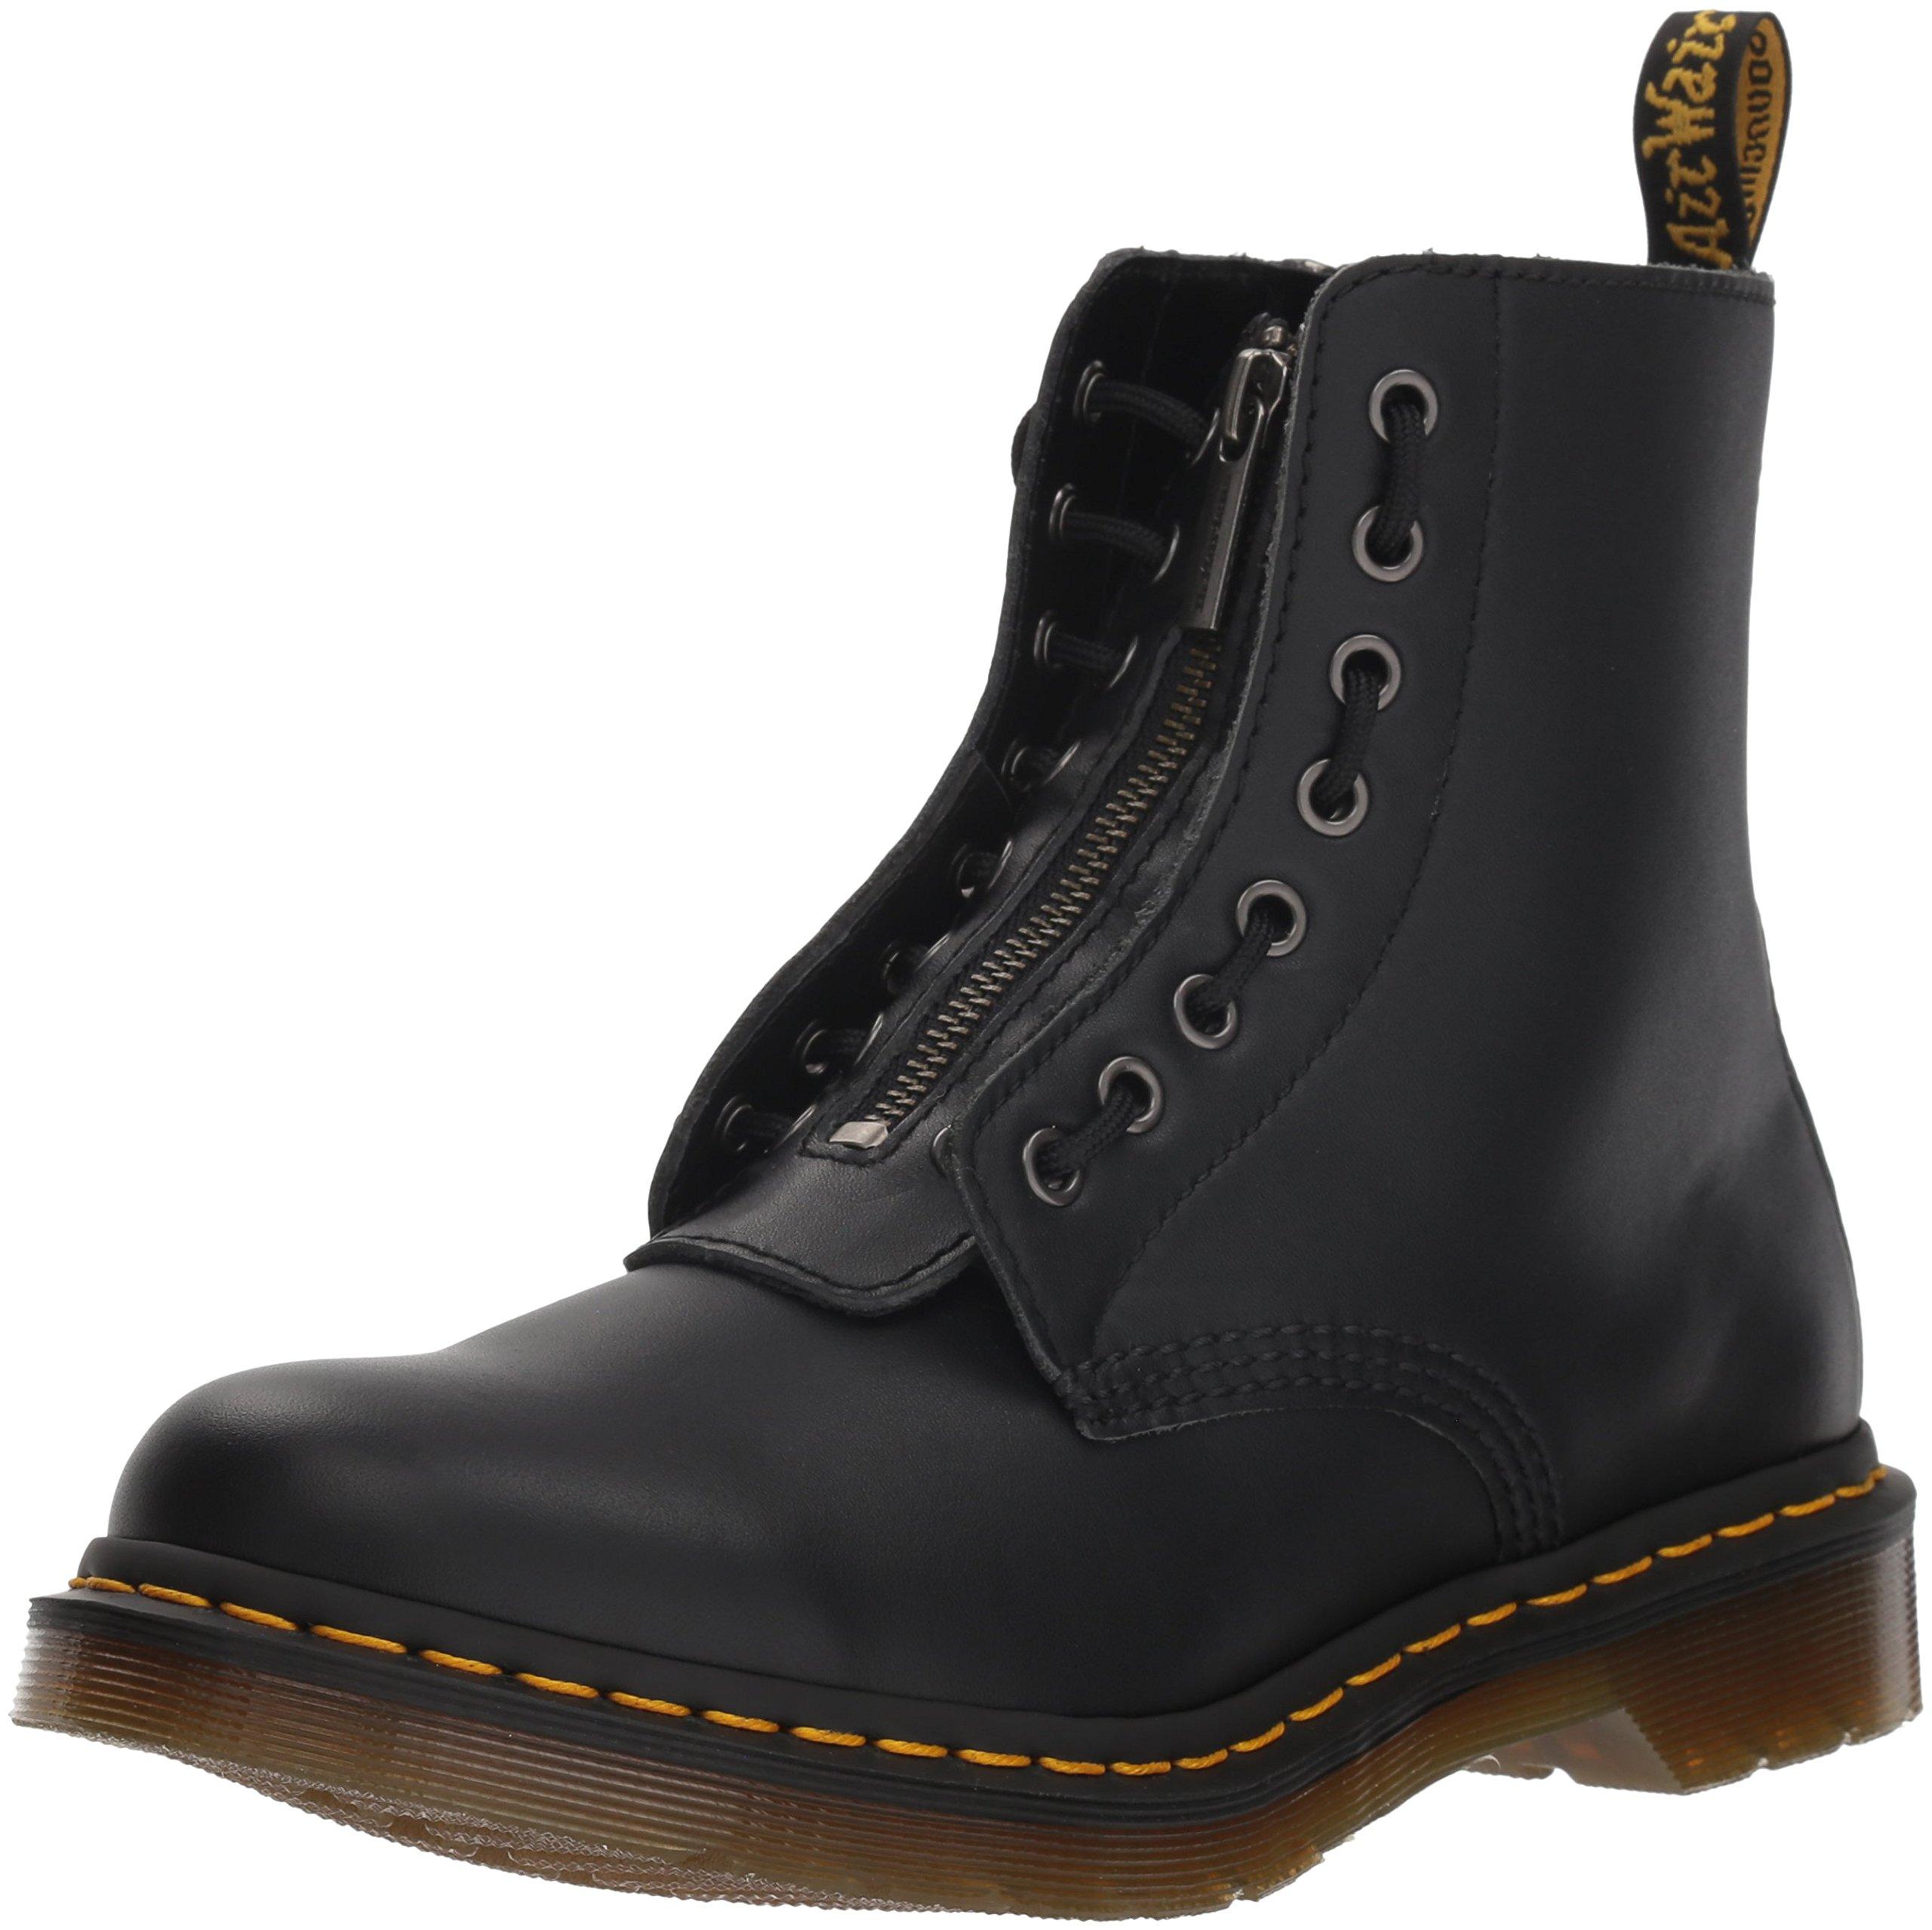 Dr. Martens Women's 1460 Pascal FRNT Zip Mid Calf Boot, Black, 6 M UK (8 US) by Dr. Martens